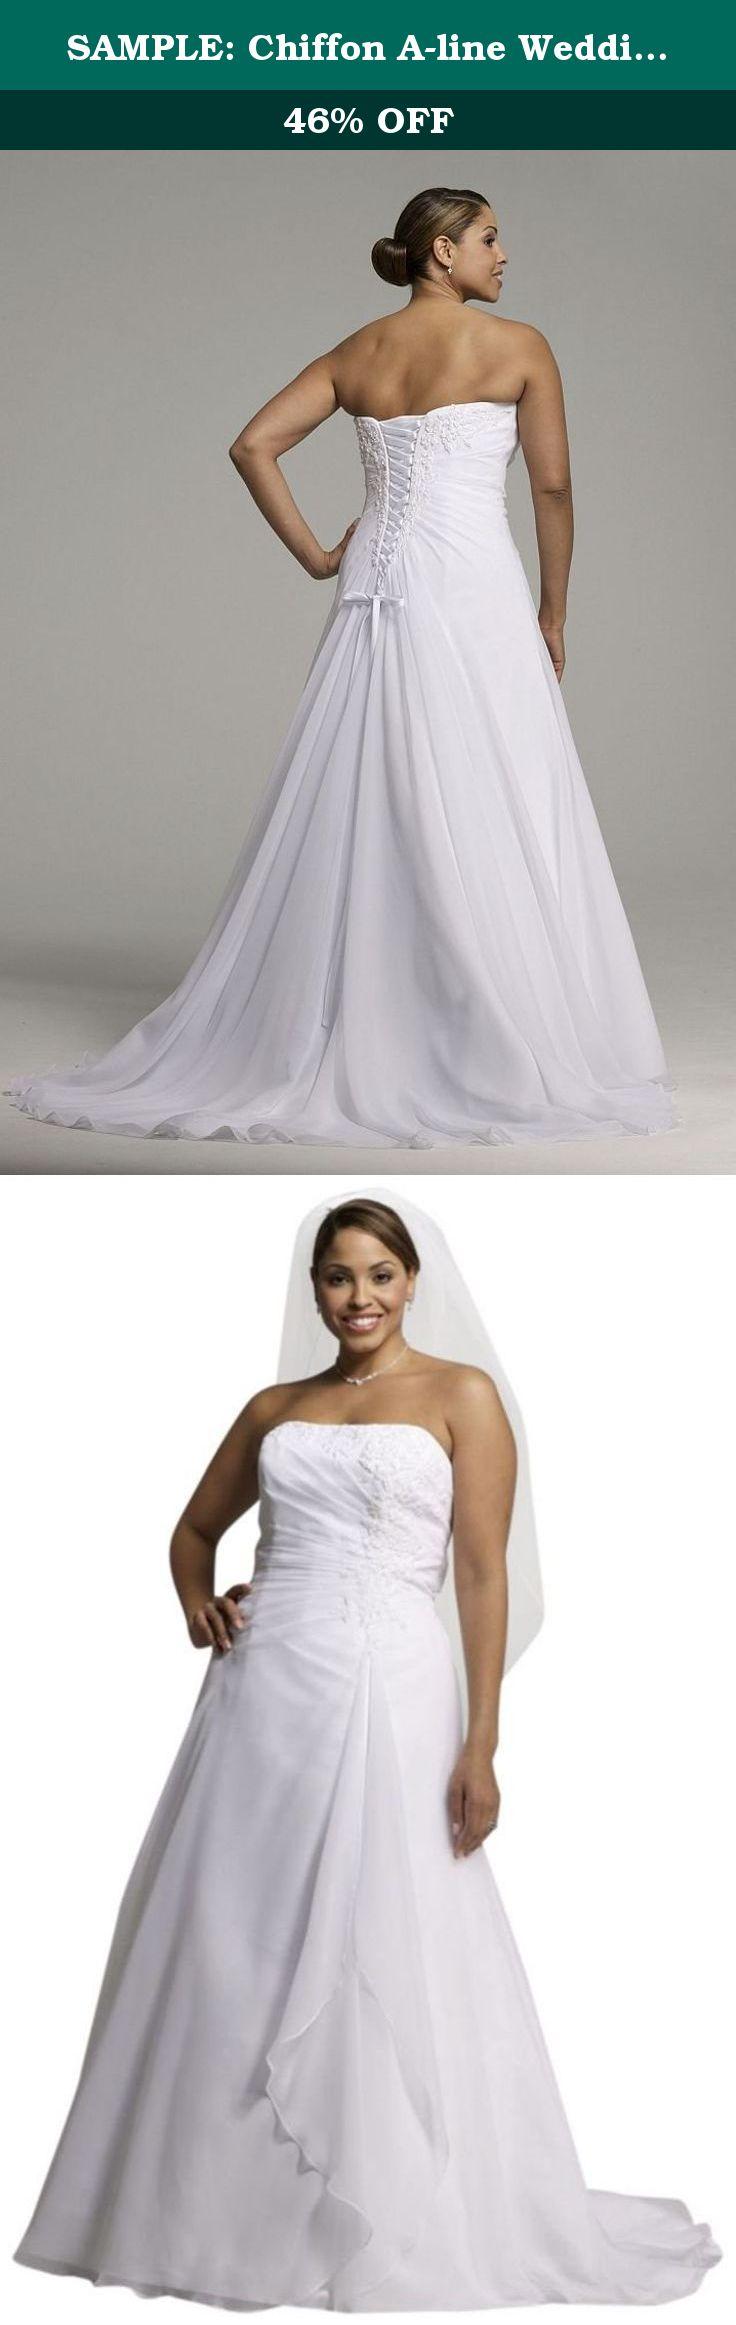 Sample chiffon aline wedding dress with side draped bodice style